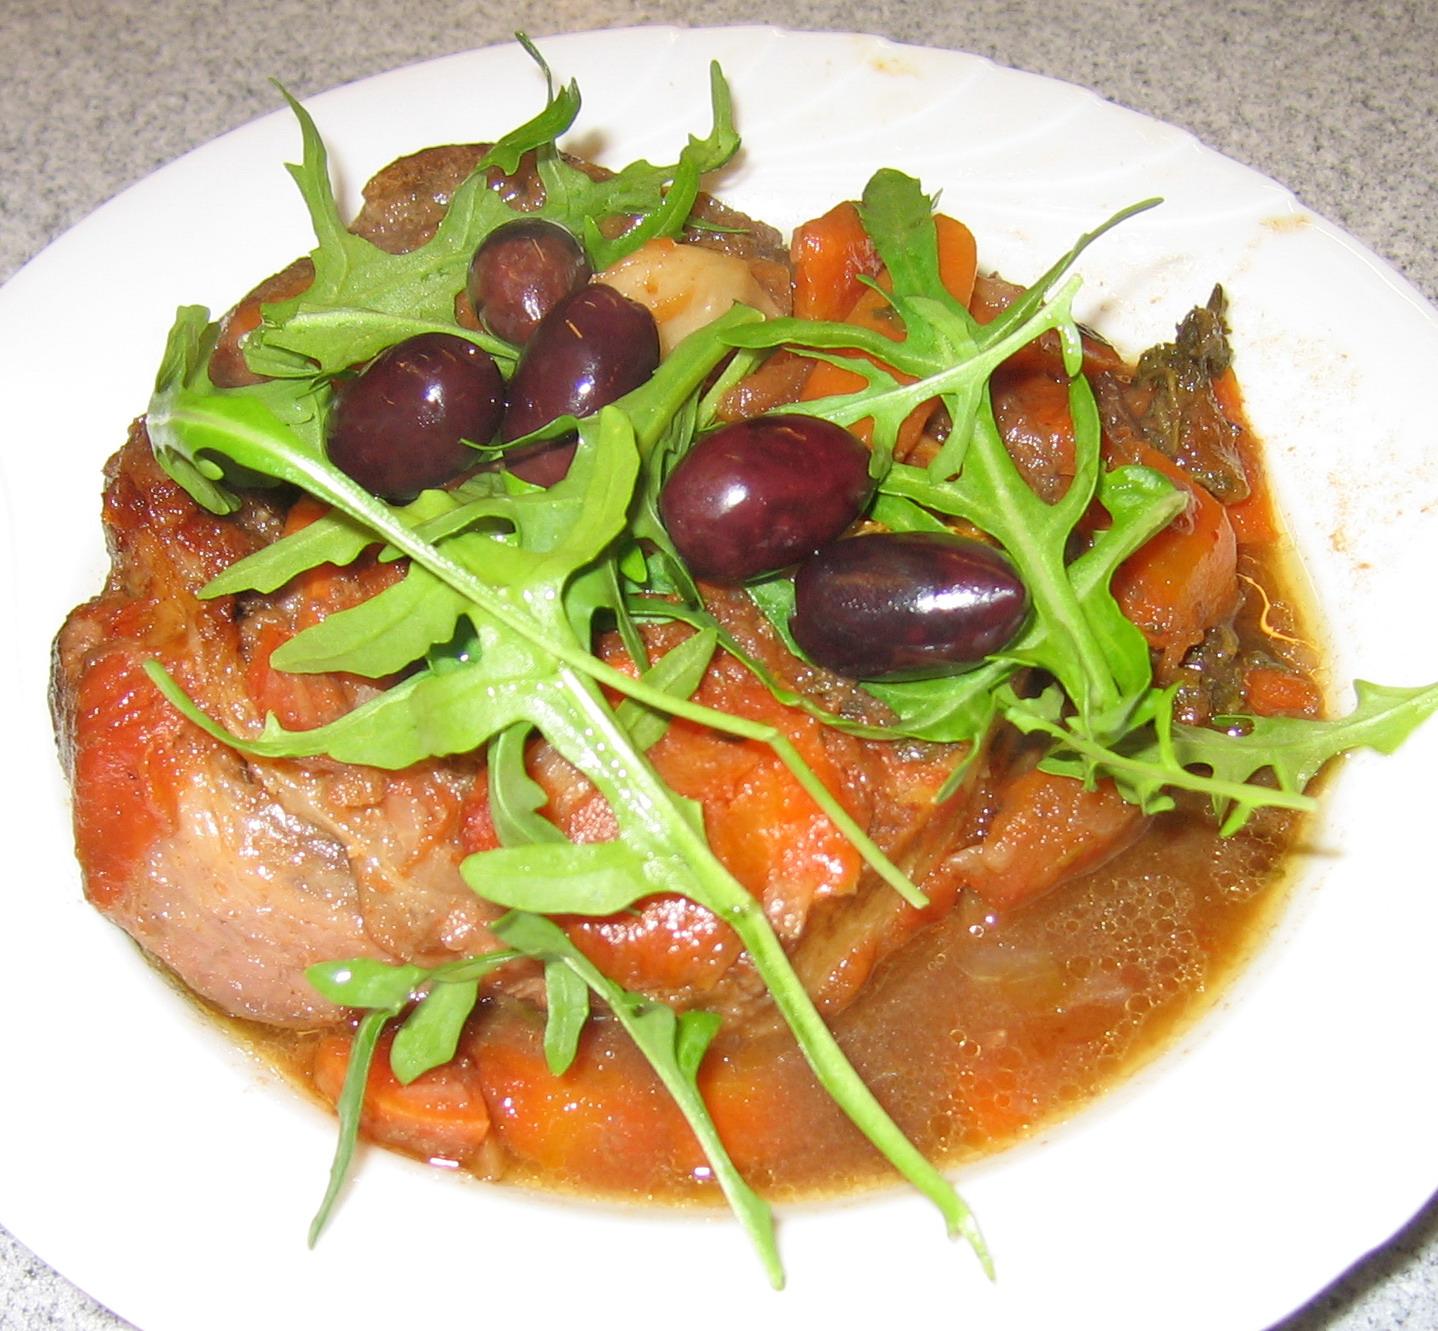 Cuisine basse temp rature 22 f - Cuisine basse temperature philippe baratte ...